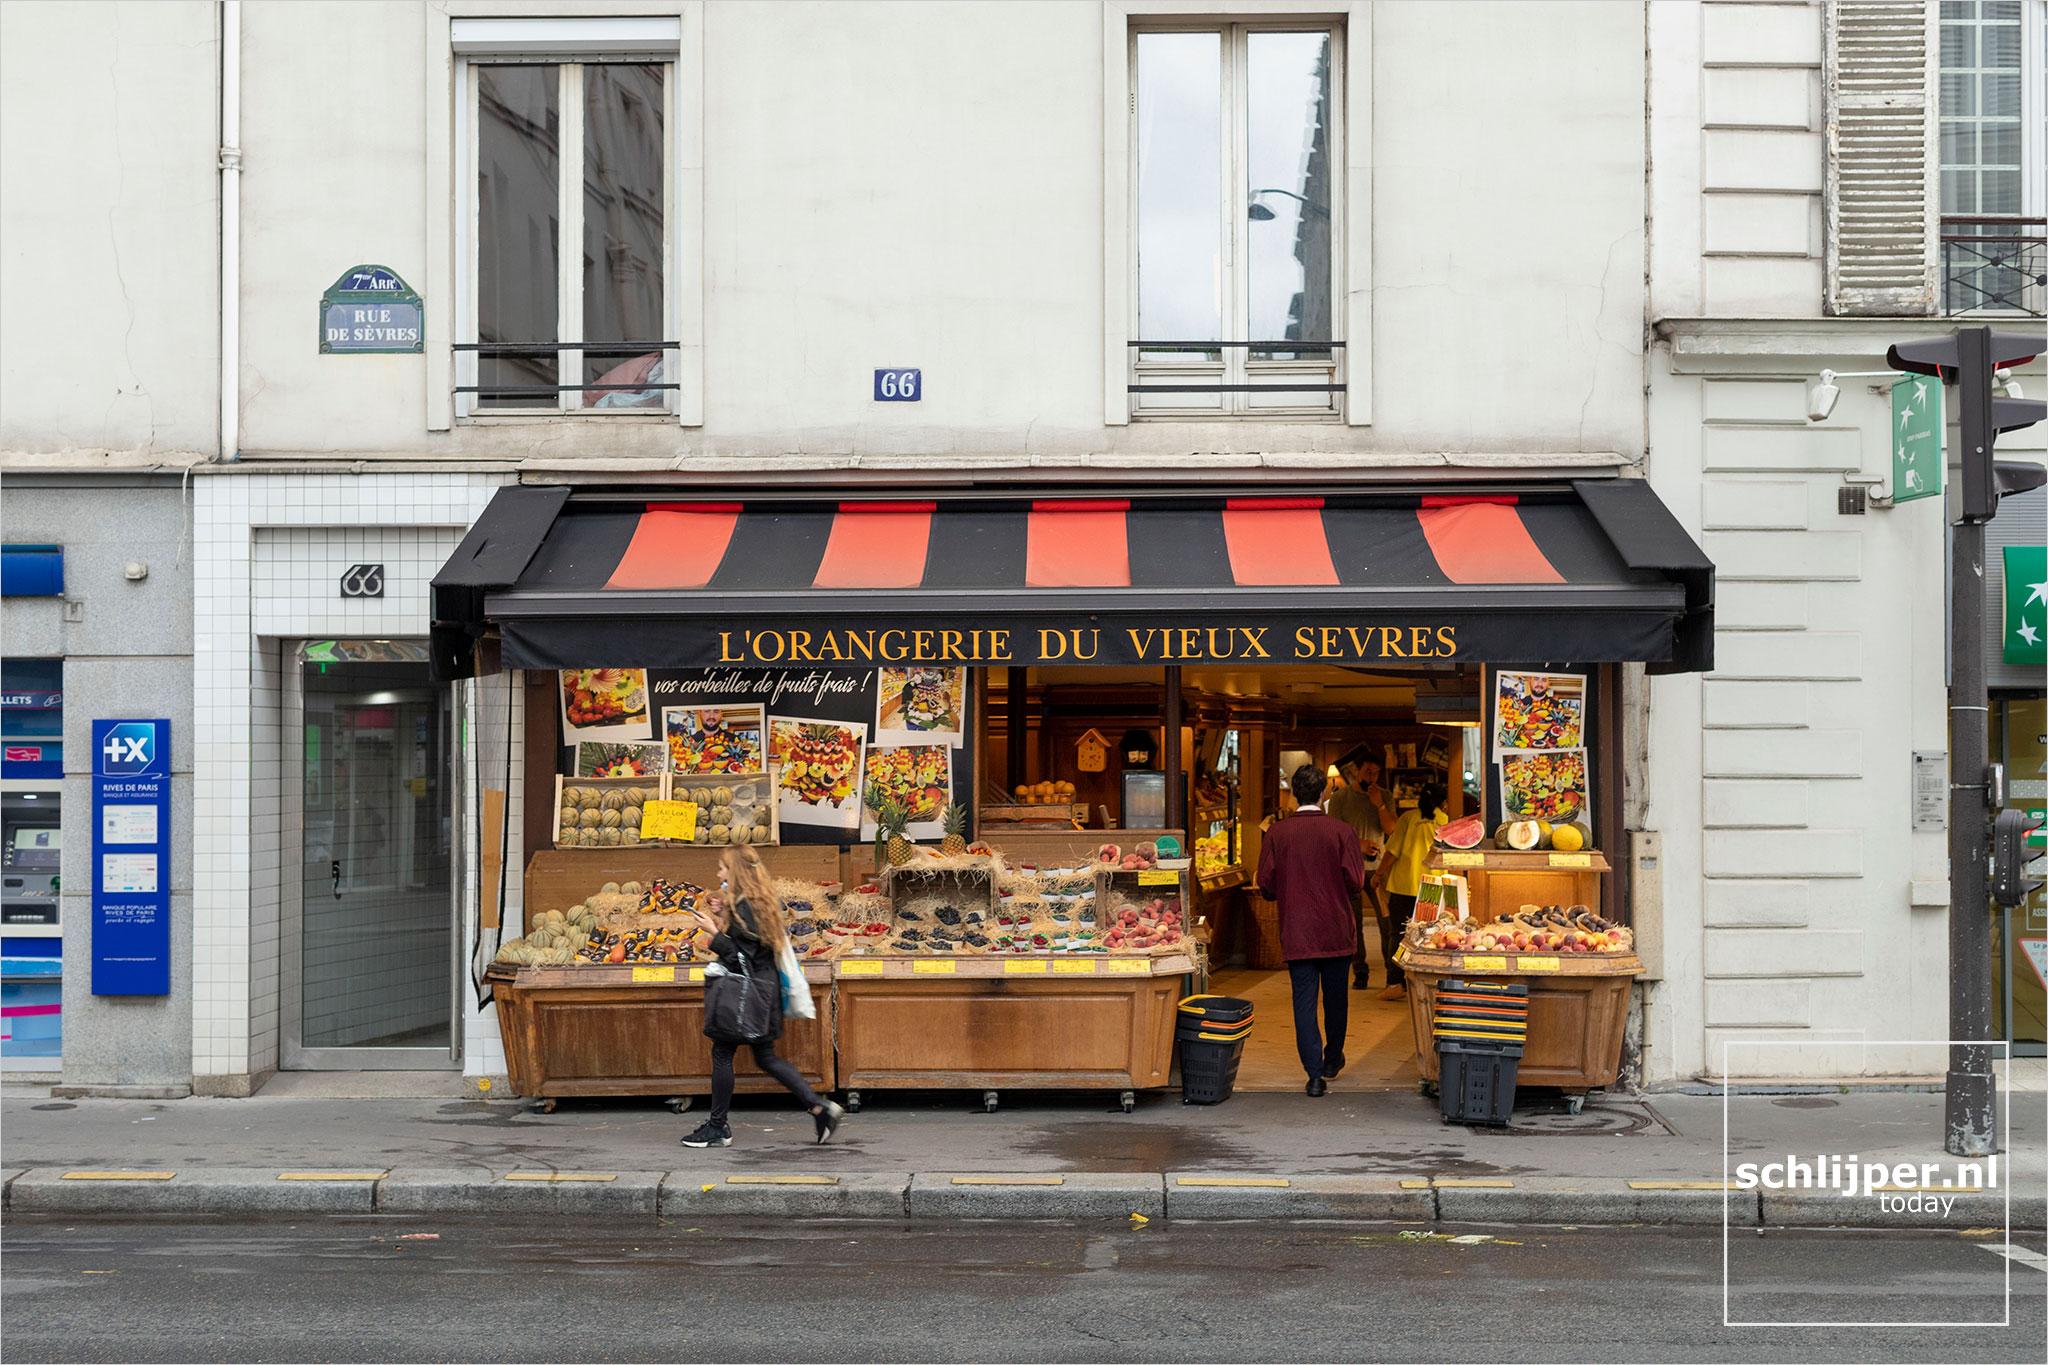 France, Paris, 15 september 2021